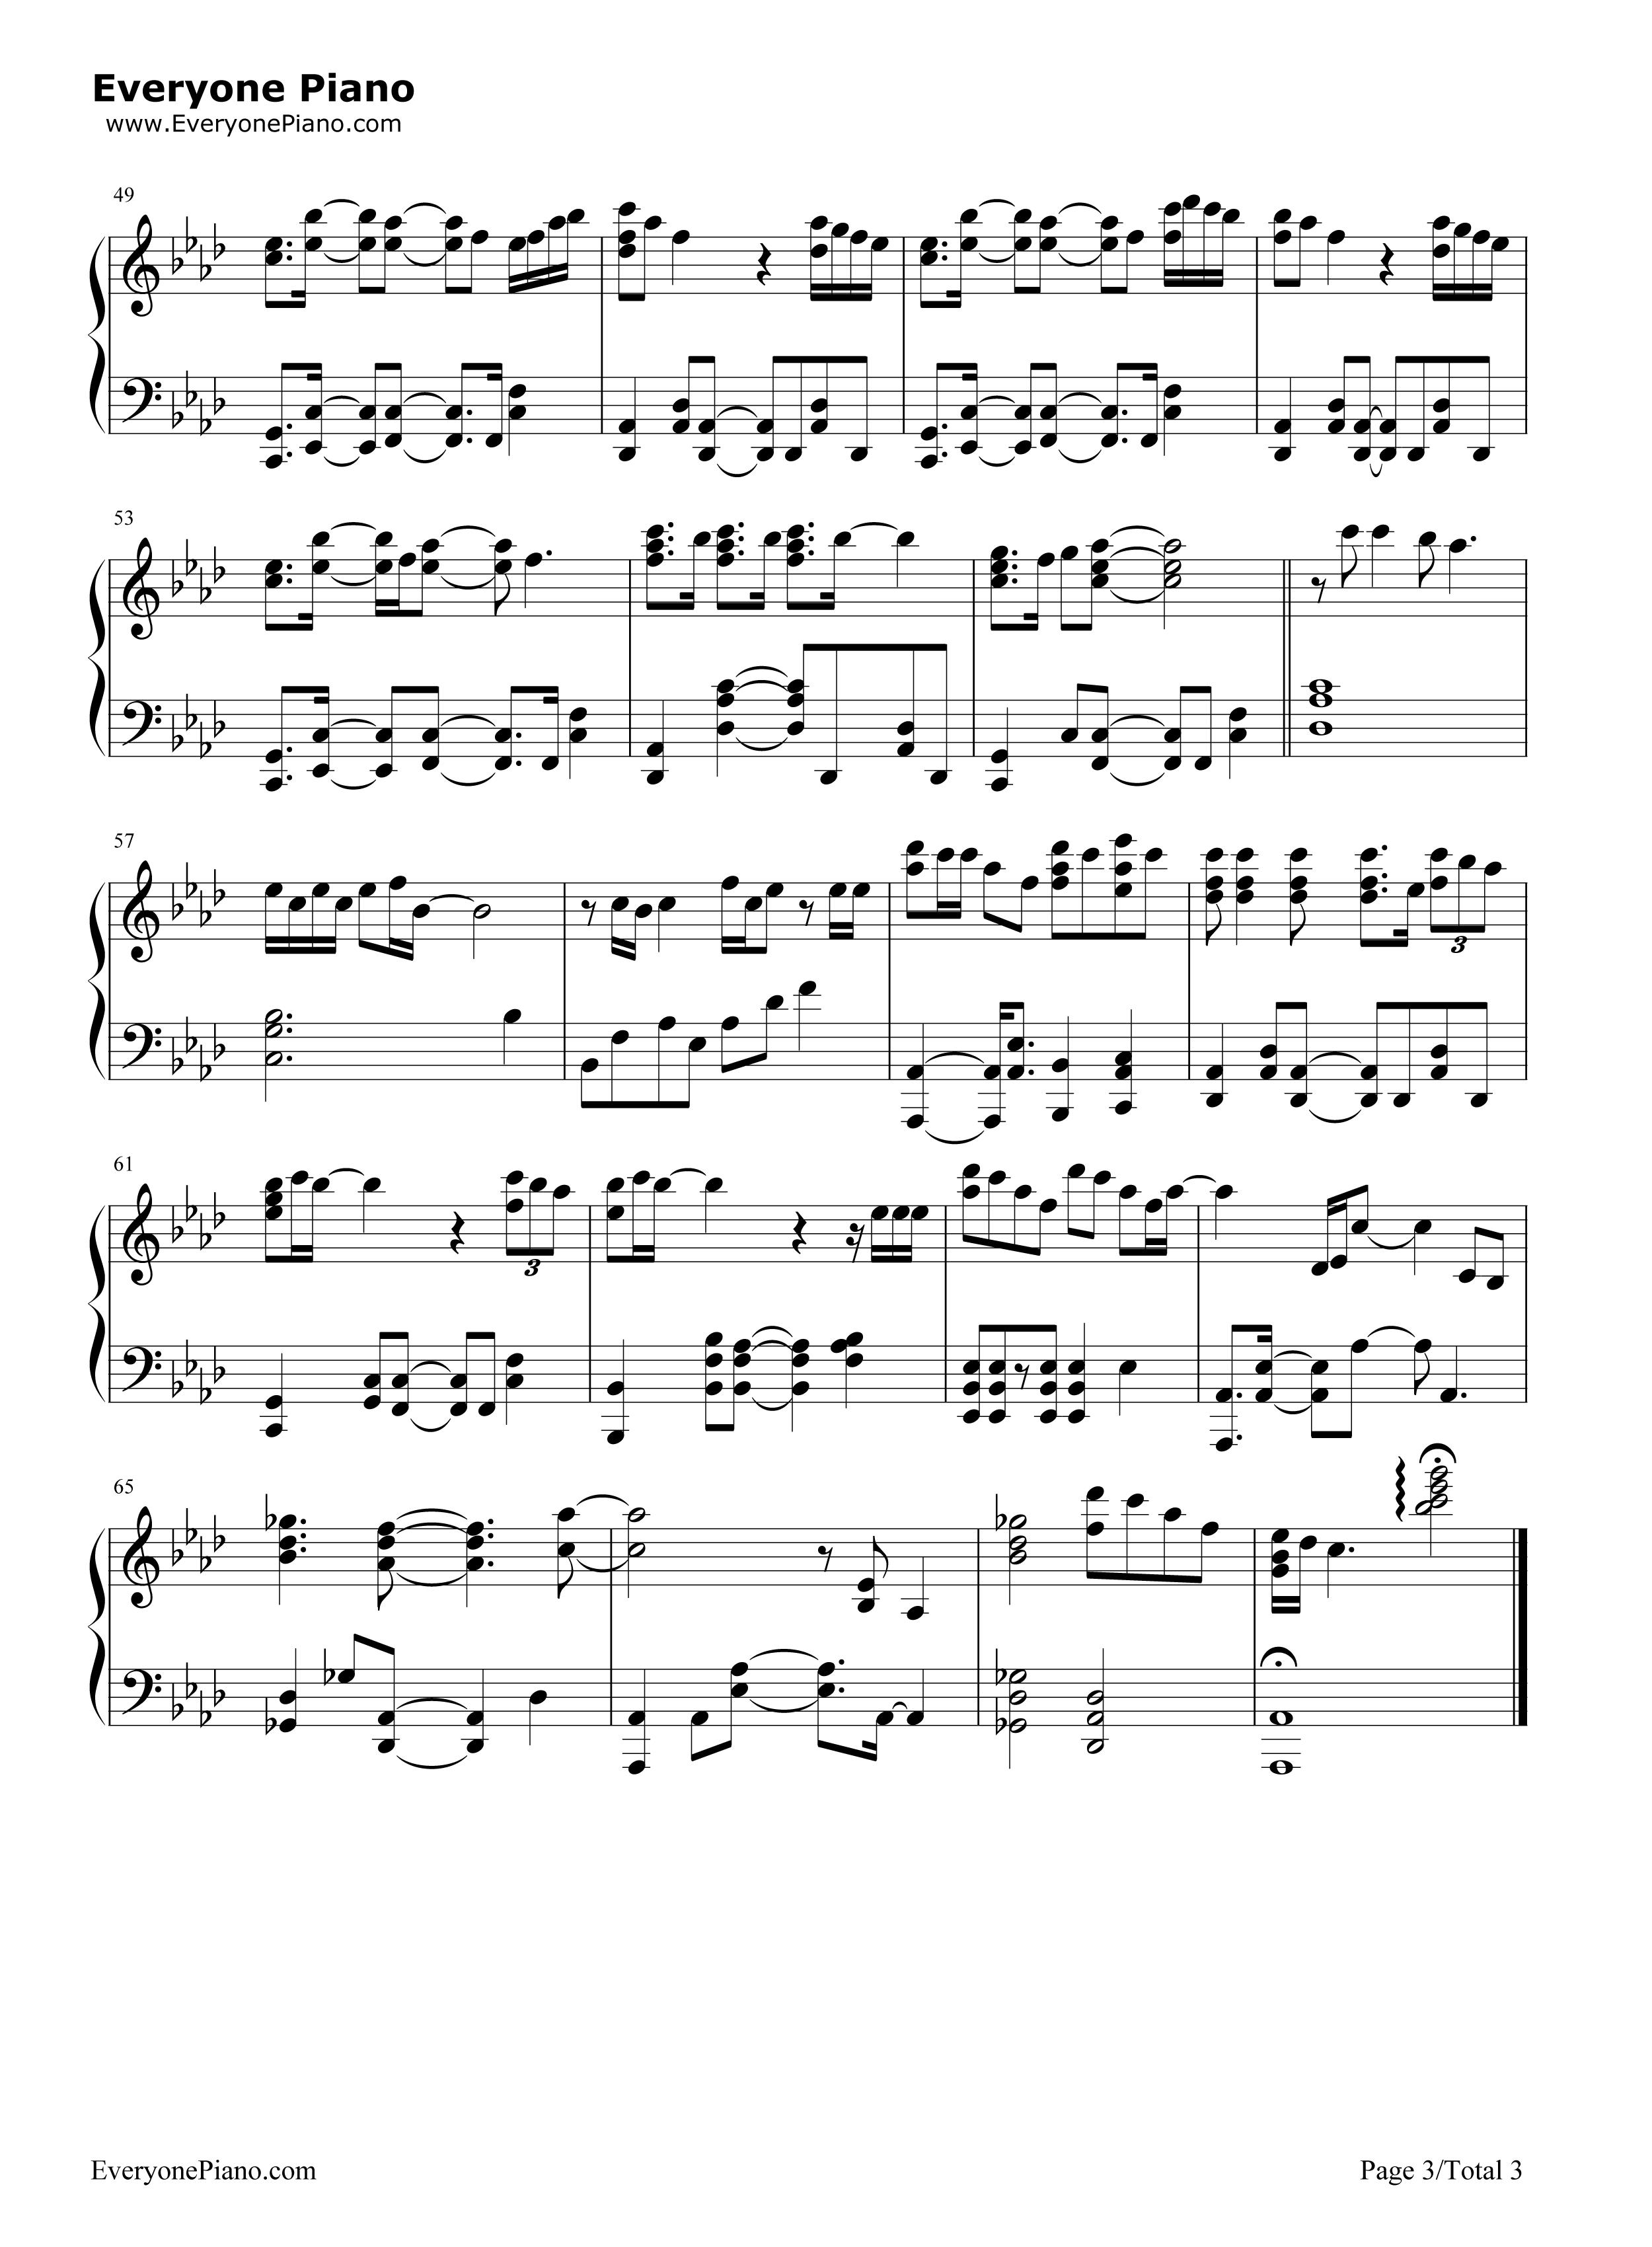 rain-金泰妍五线谱预览3-钢琴谱档(五线谱,双手简谱